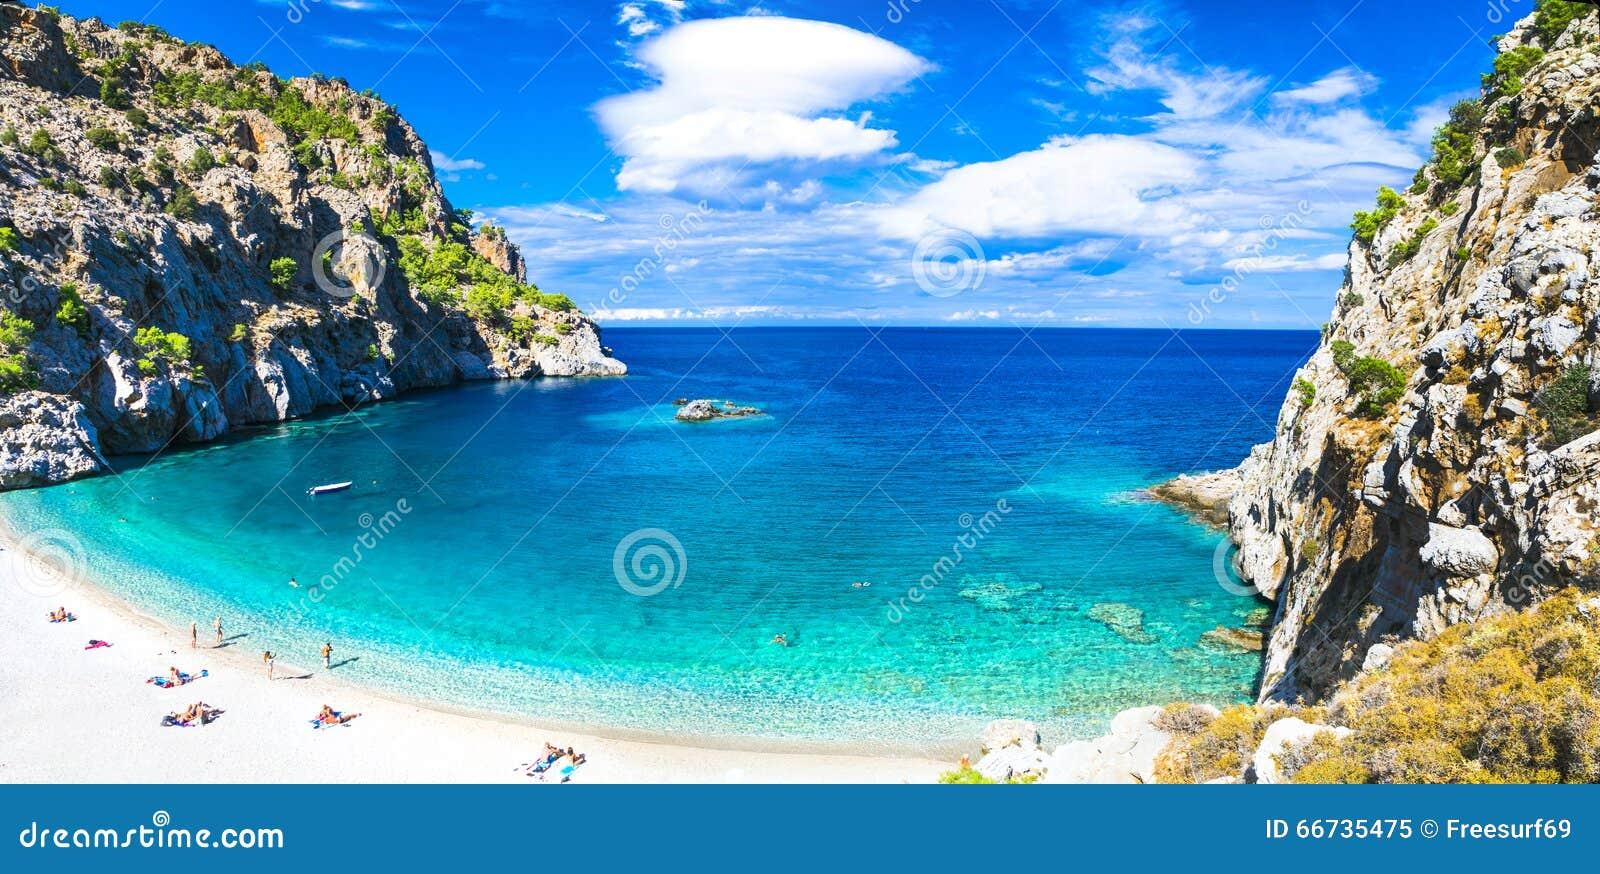 Beautiful beaches of Greece - Apella, Karpathos island